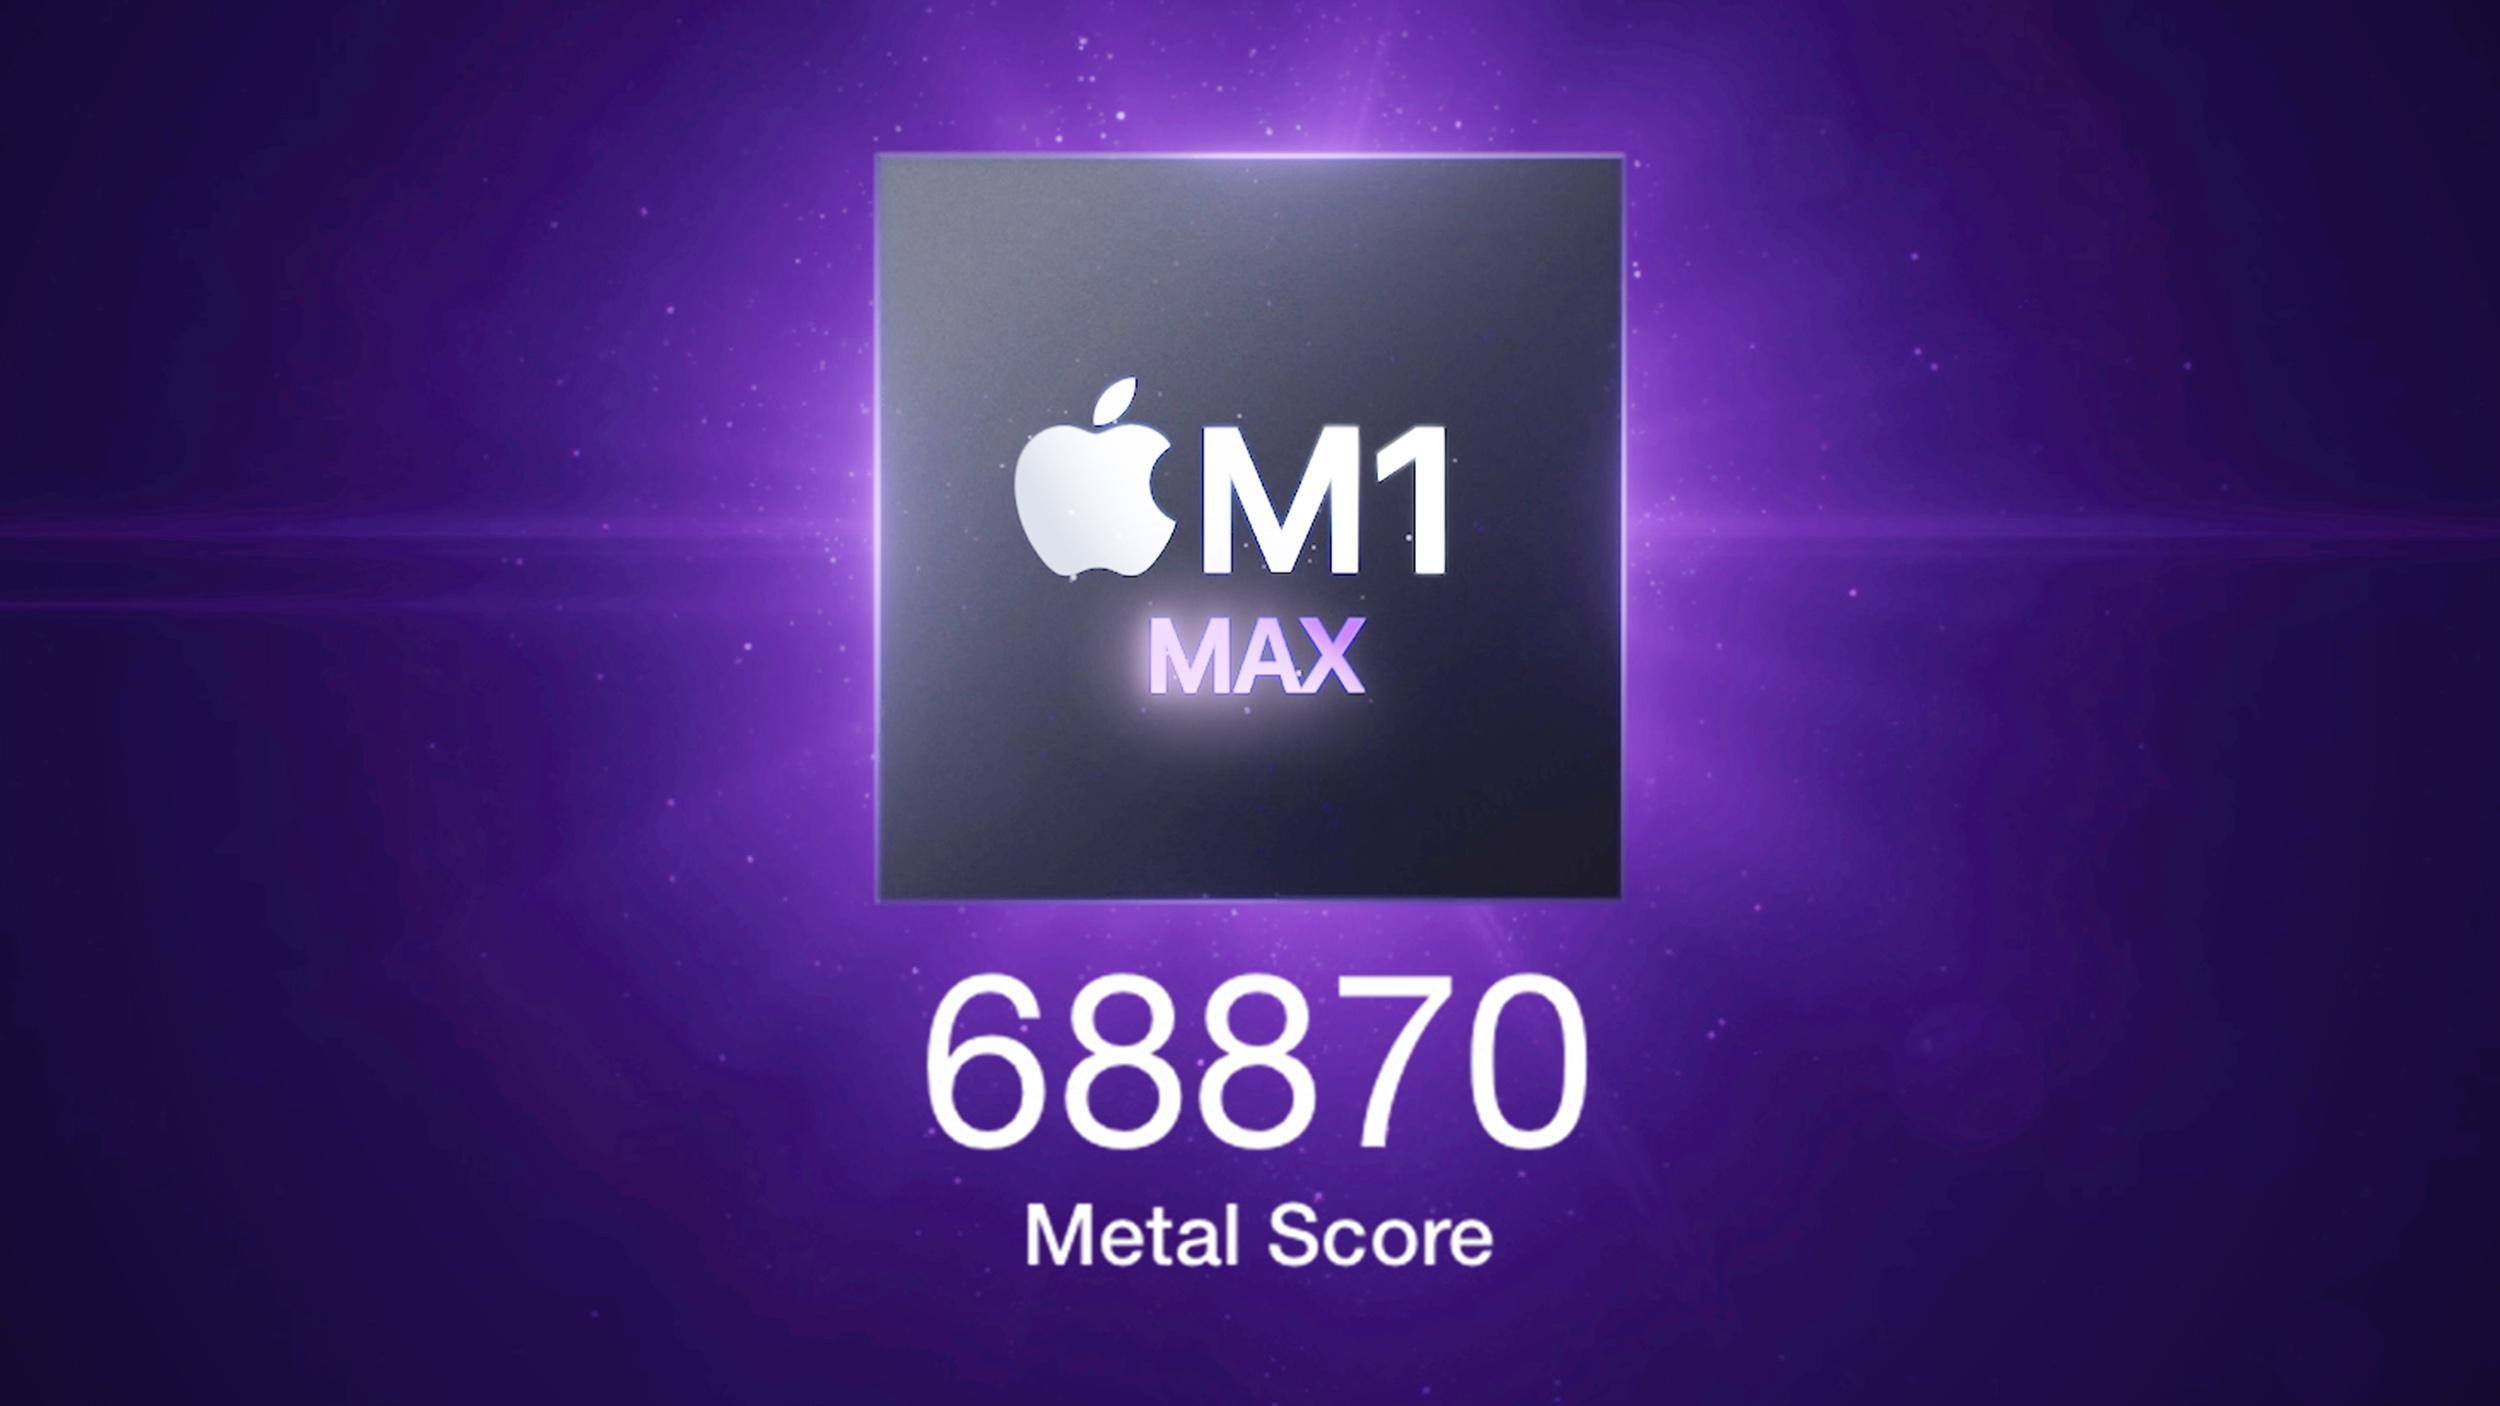 M1 Max Metal Score